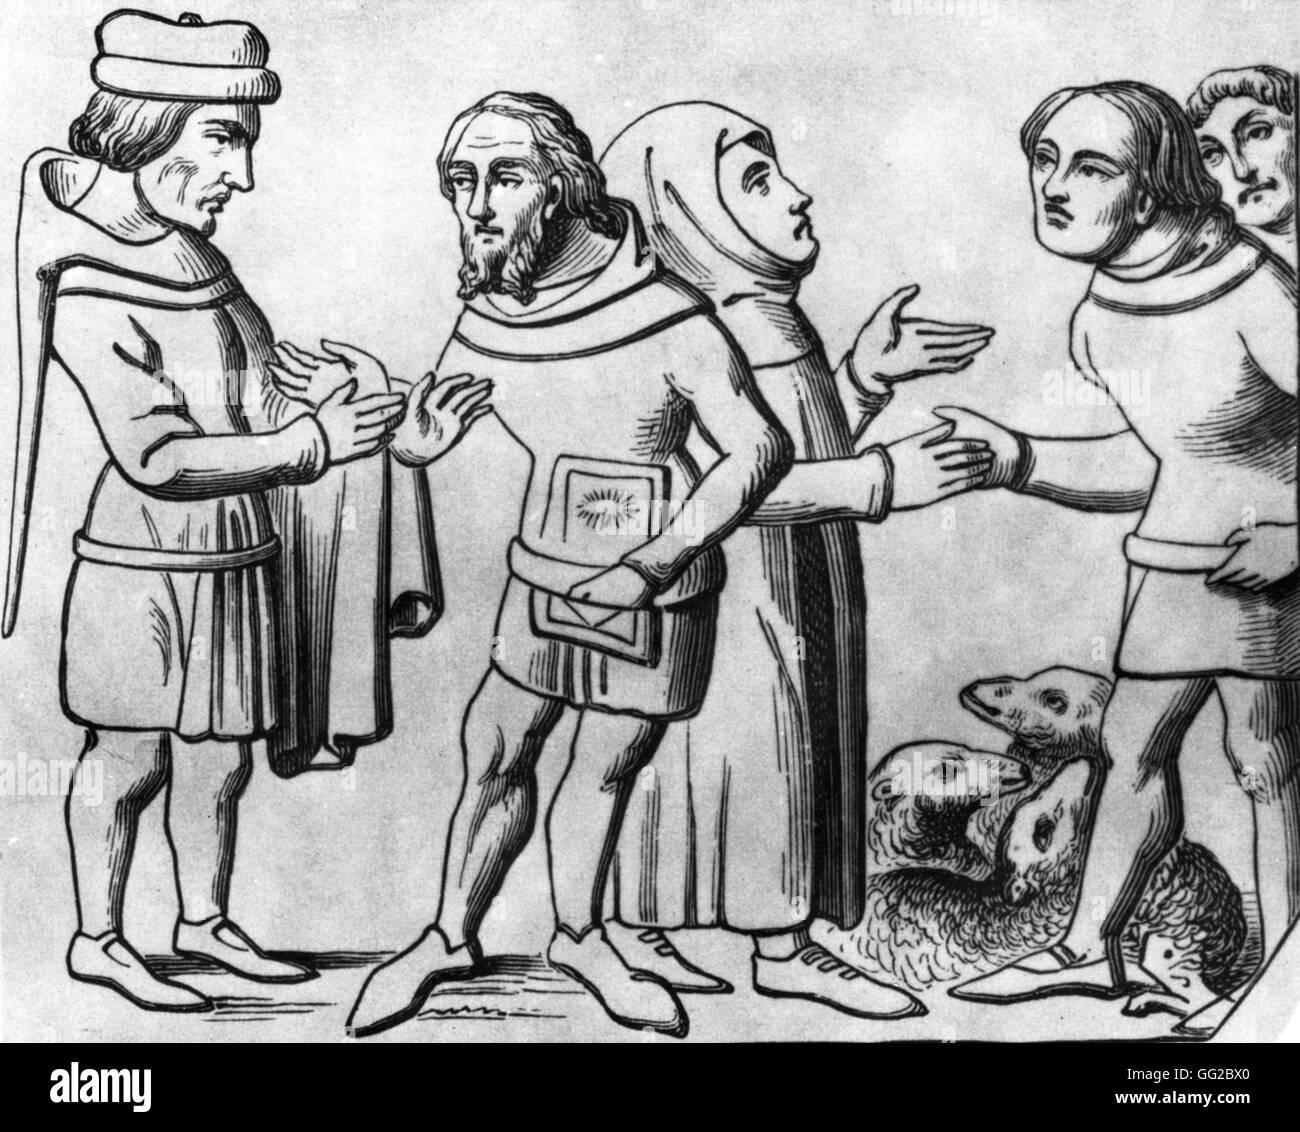 Merchants Miniature, Middle Ages France - Stock Image